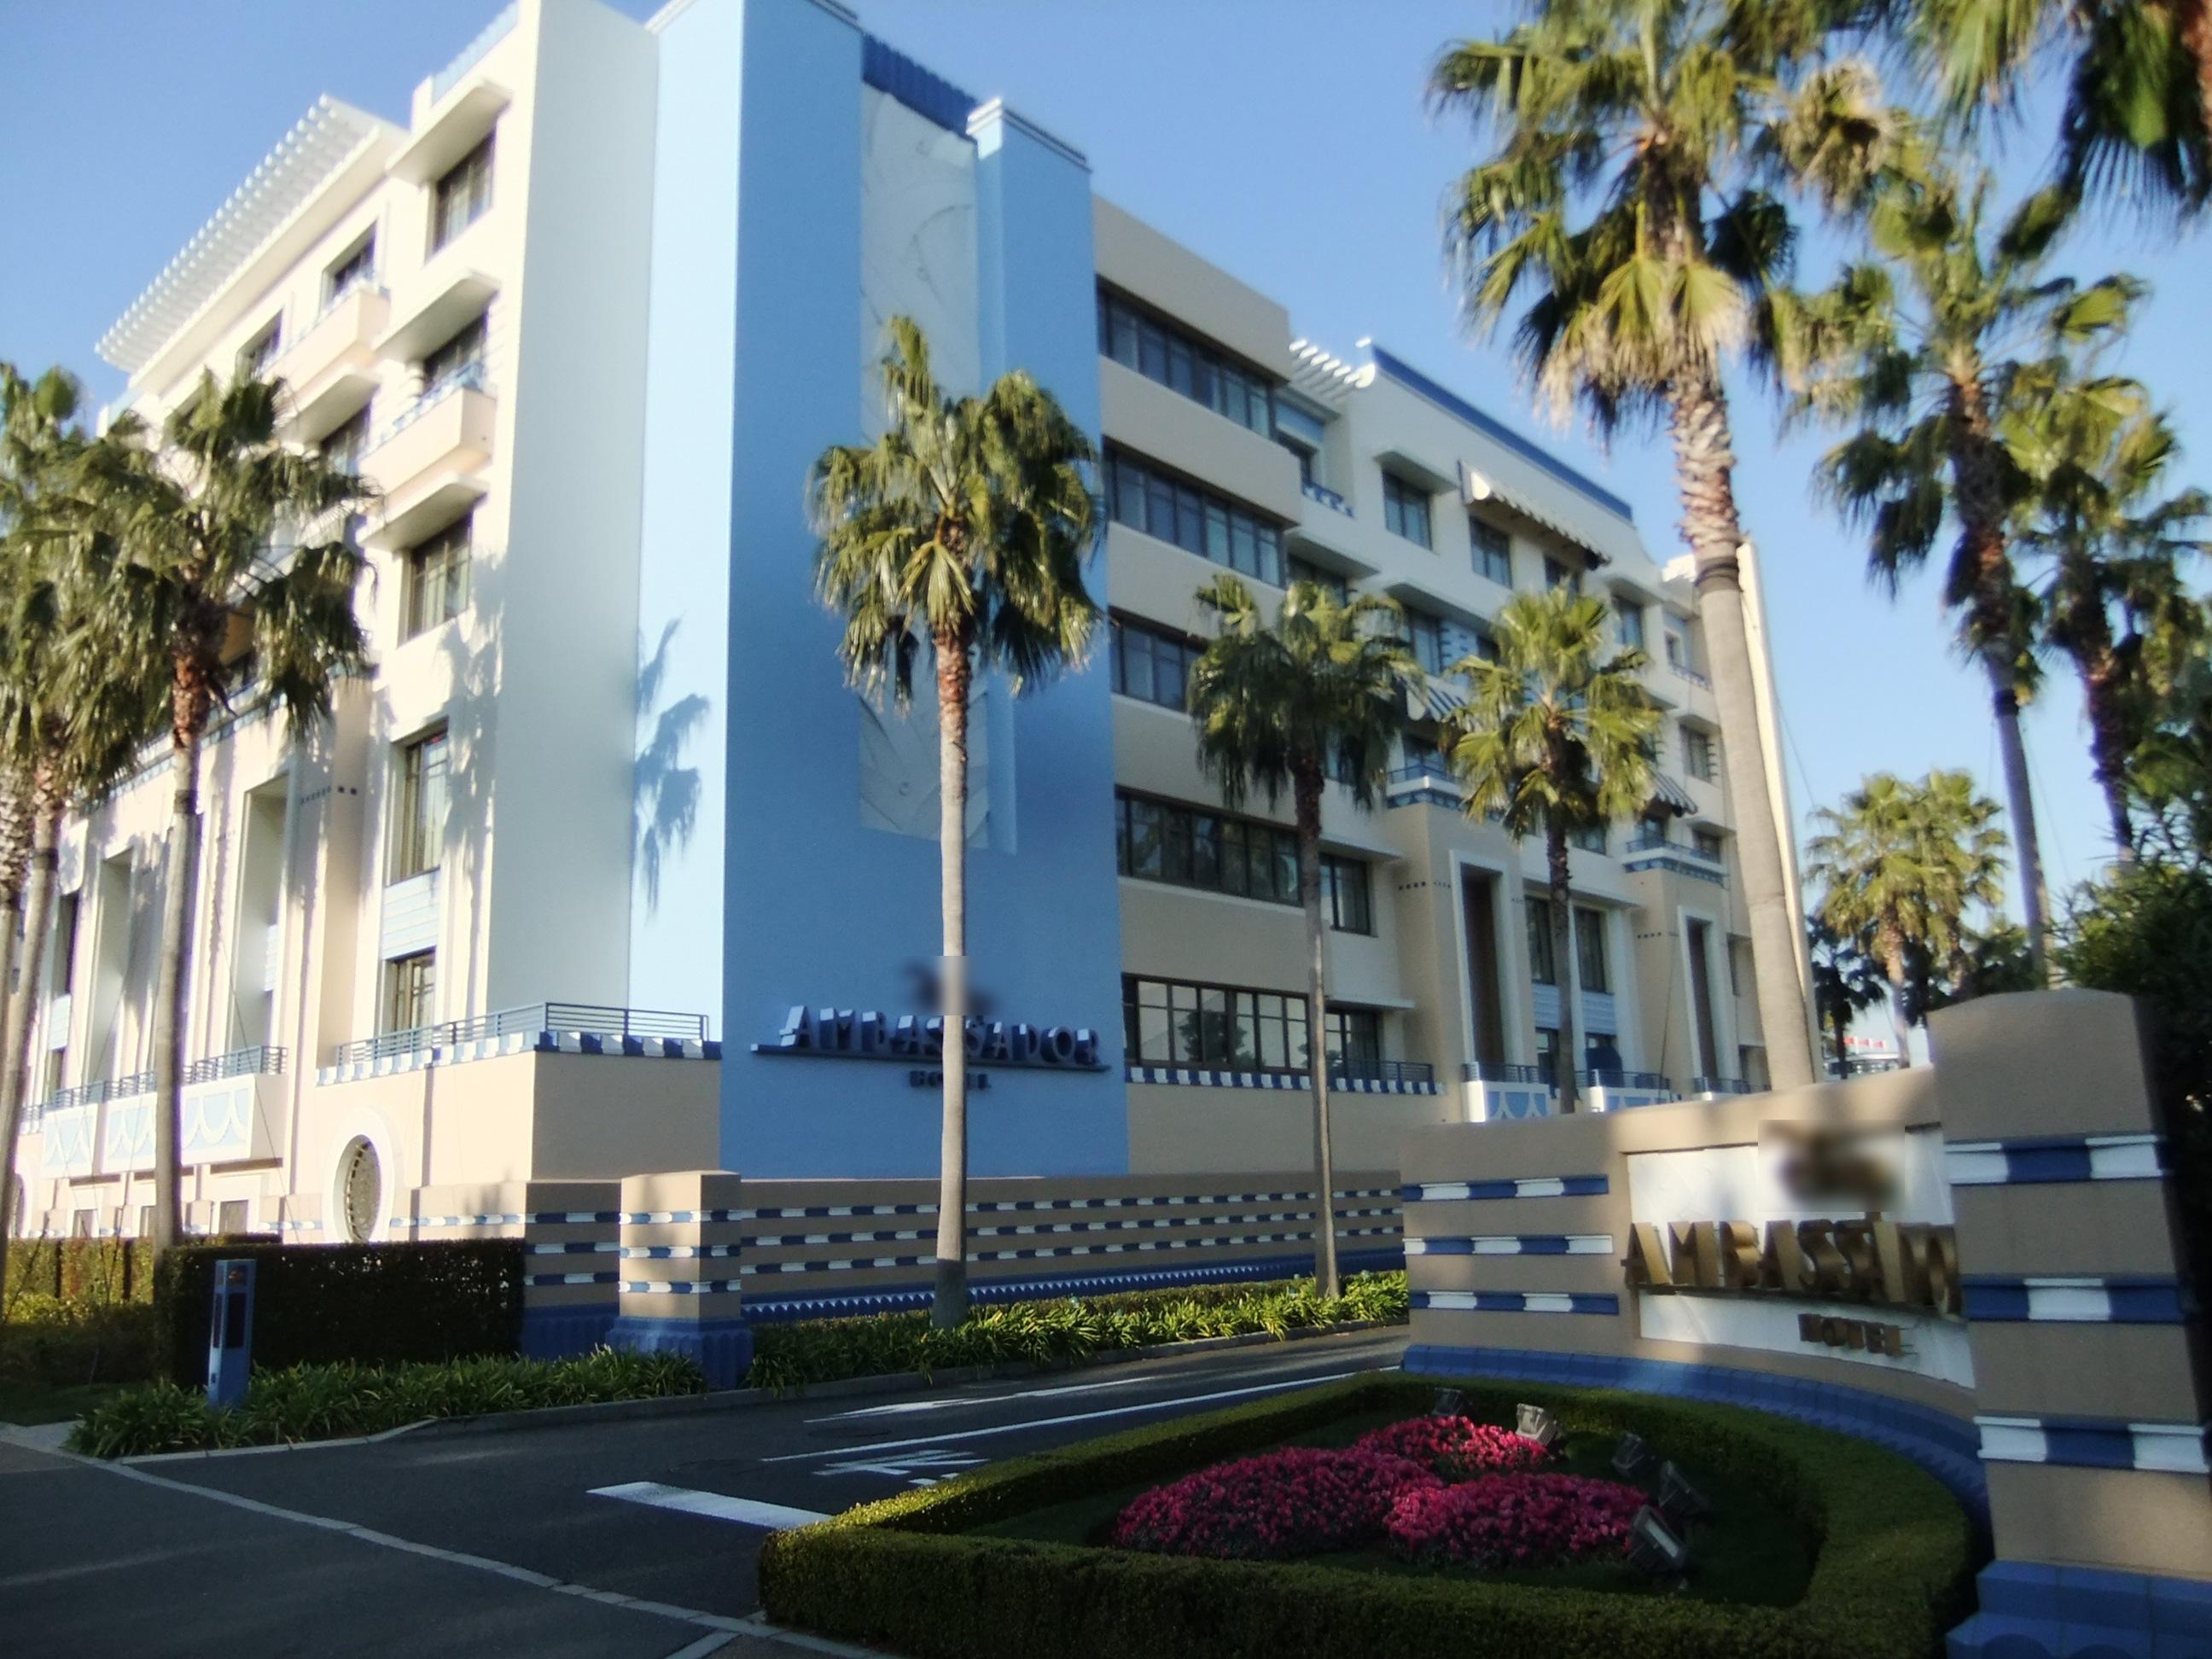 fichier disney ambassador hotel jpg wikipédia